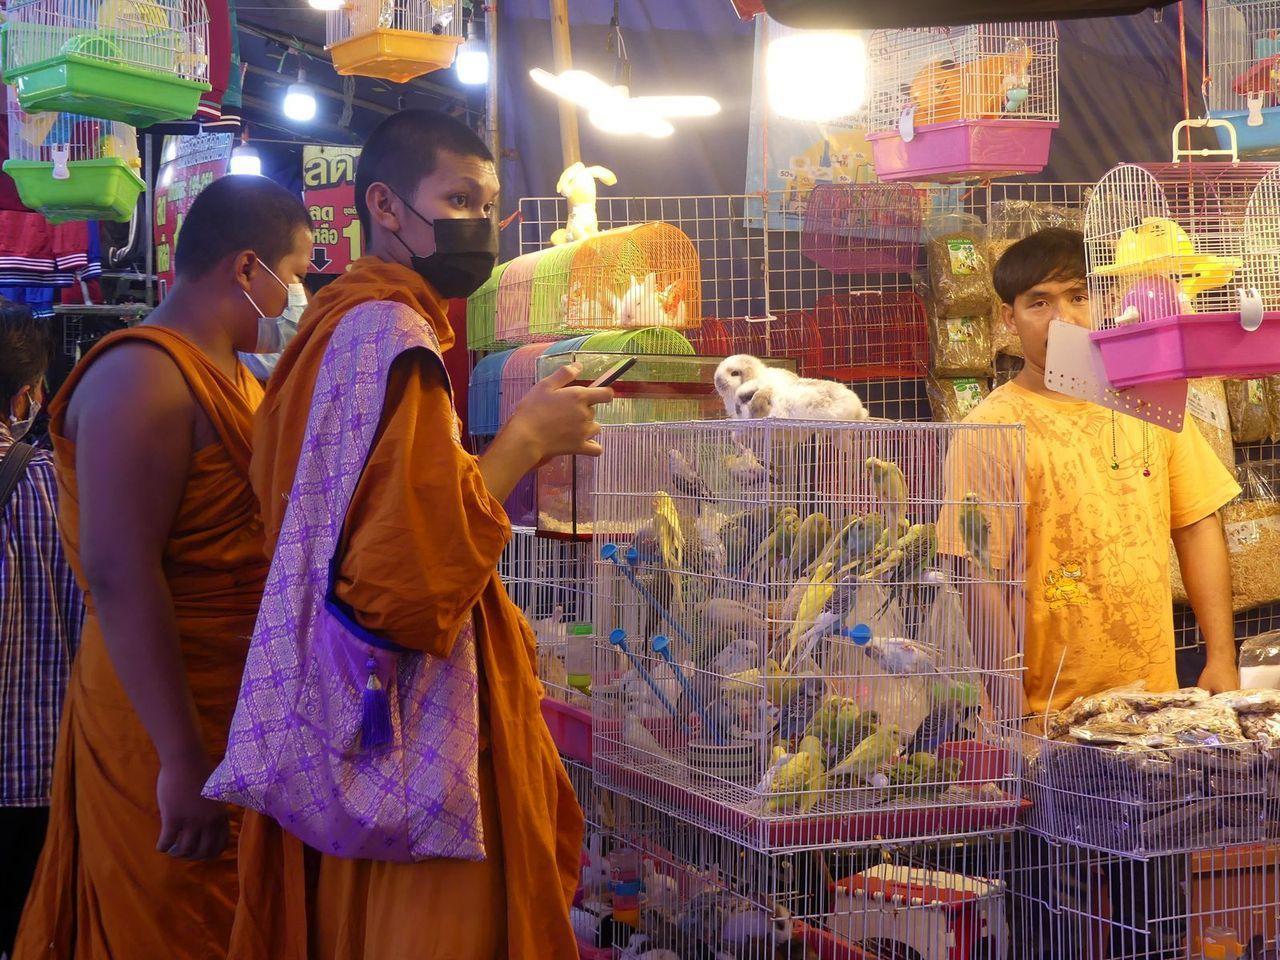 Visages de Thaïlande (21-15)